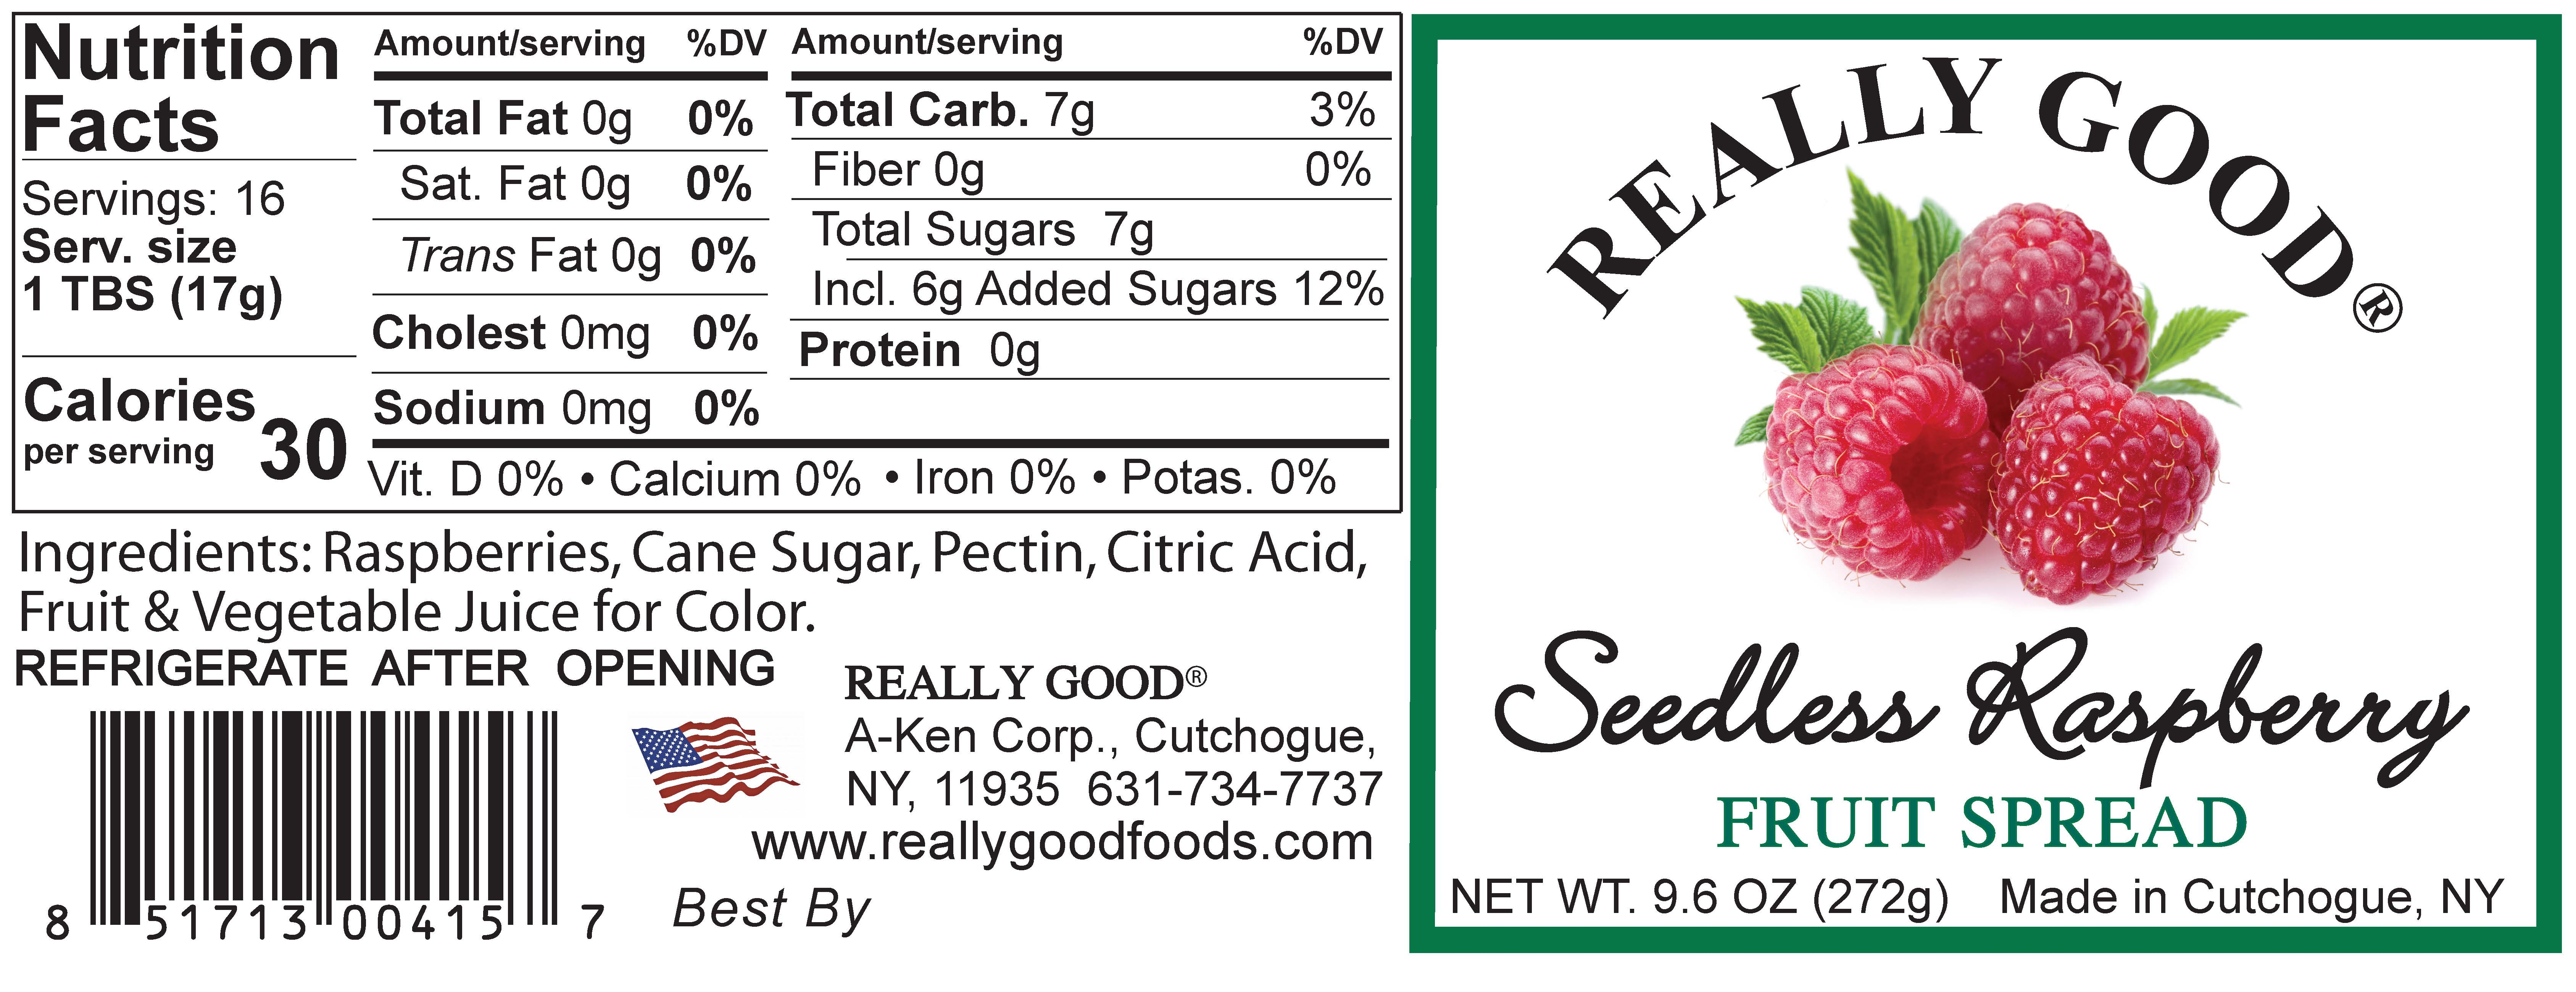 seedless-raspberry-9.6oz-label.jpg